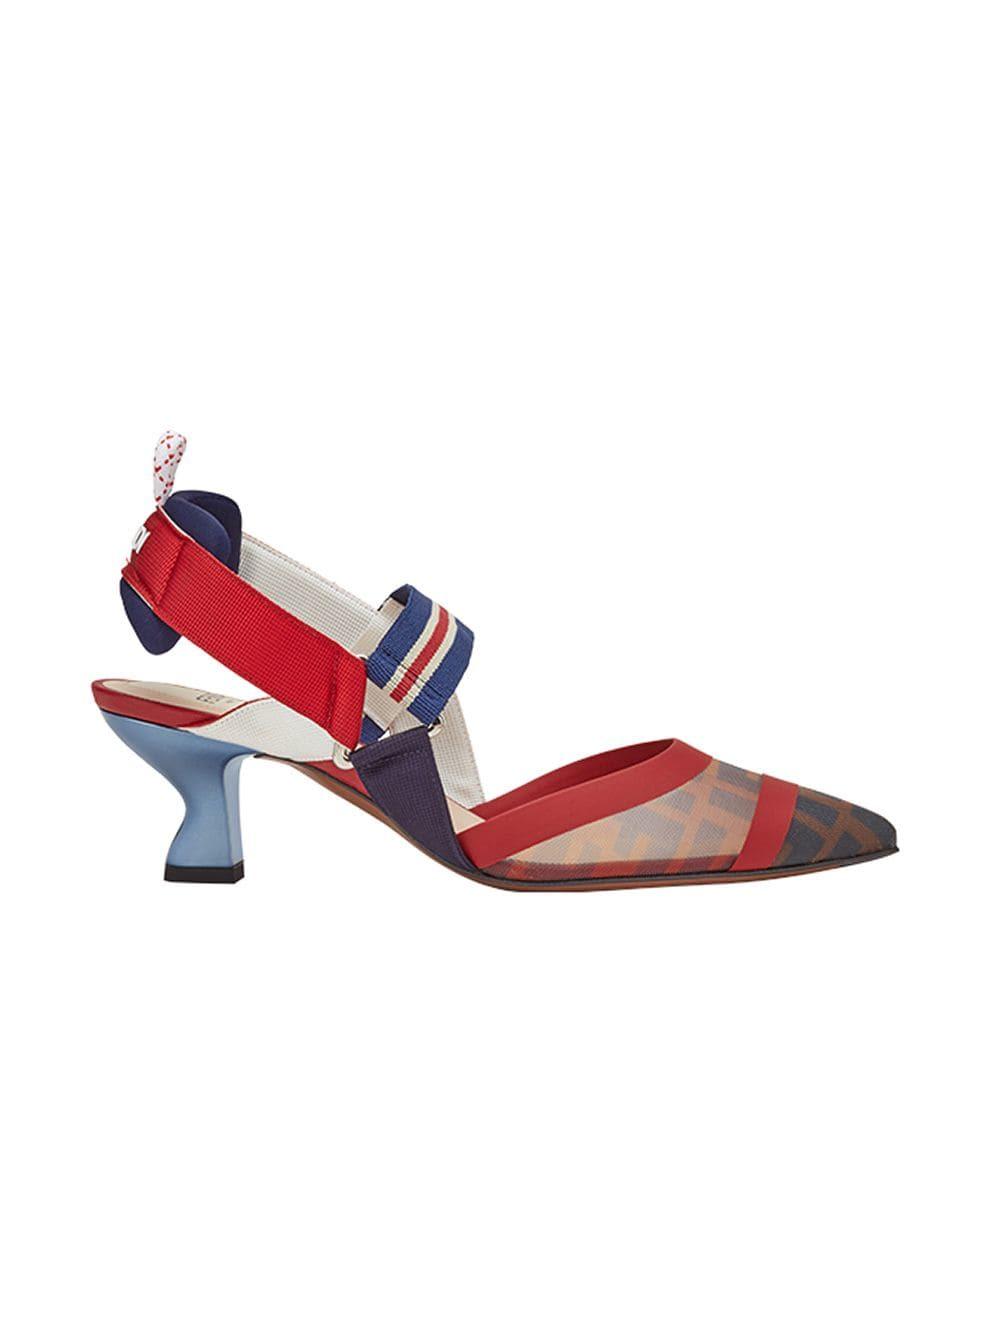 Fendi Shoes Fendi Colibrí Slingback Pumps